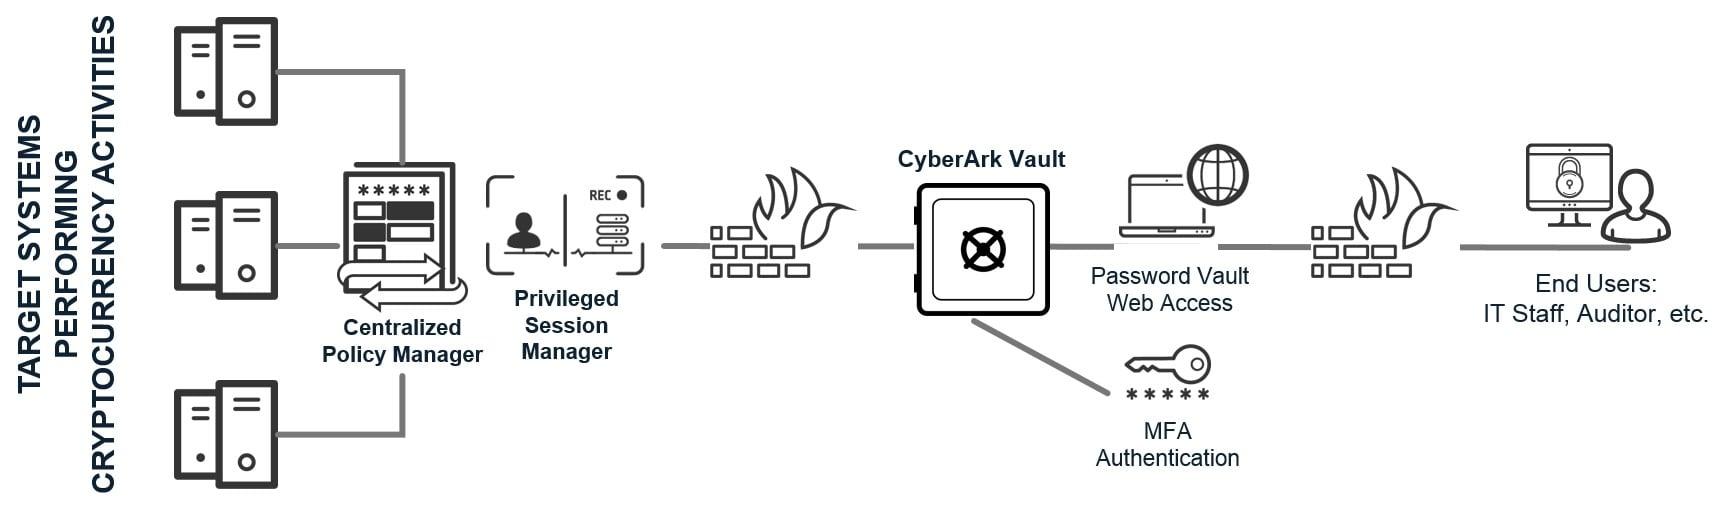 Energian Saasto—These Cyberark Api Access